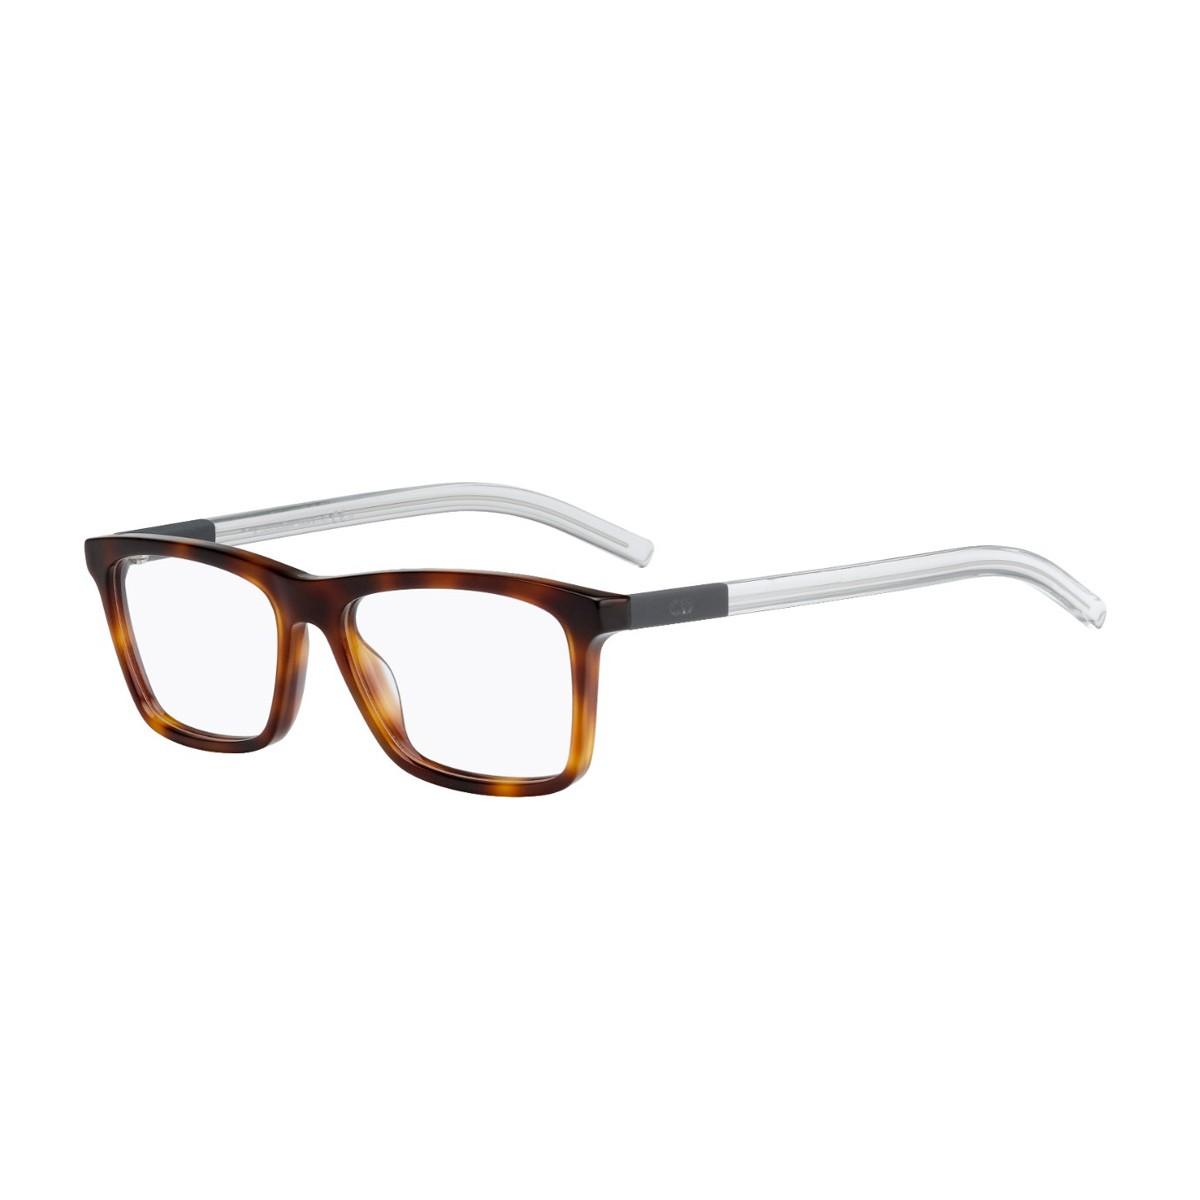 Dior Blacktie215 | Occhiali da Vista